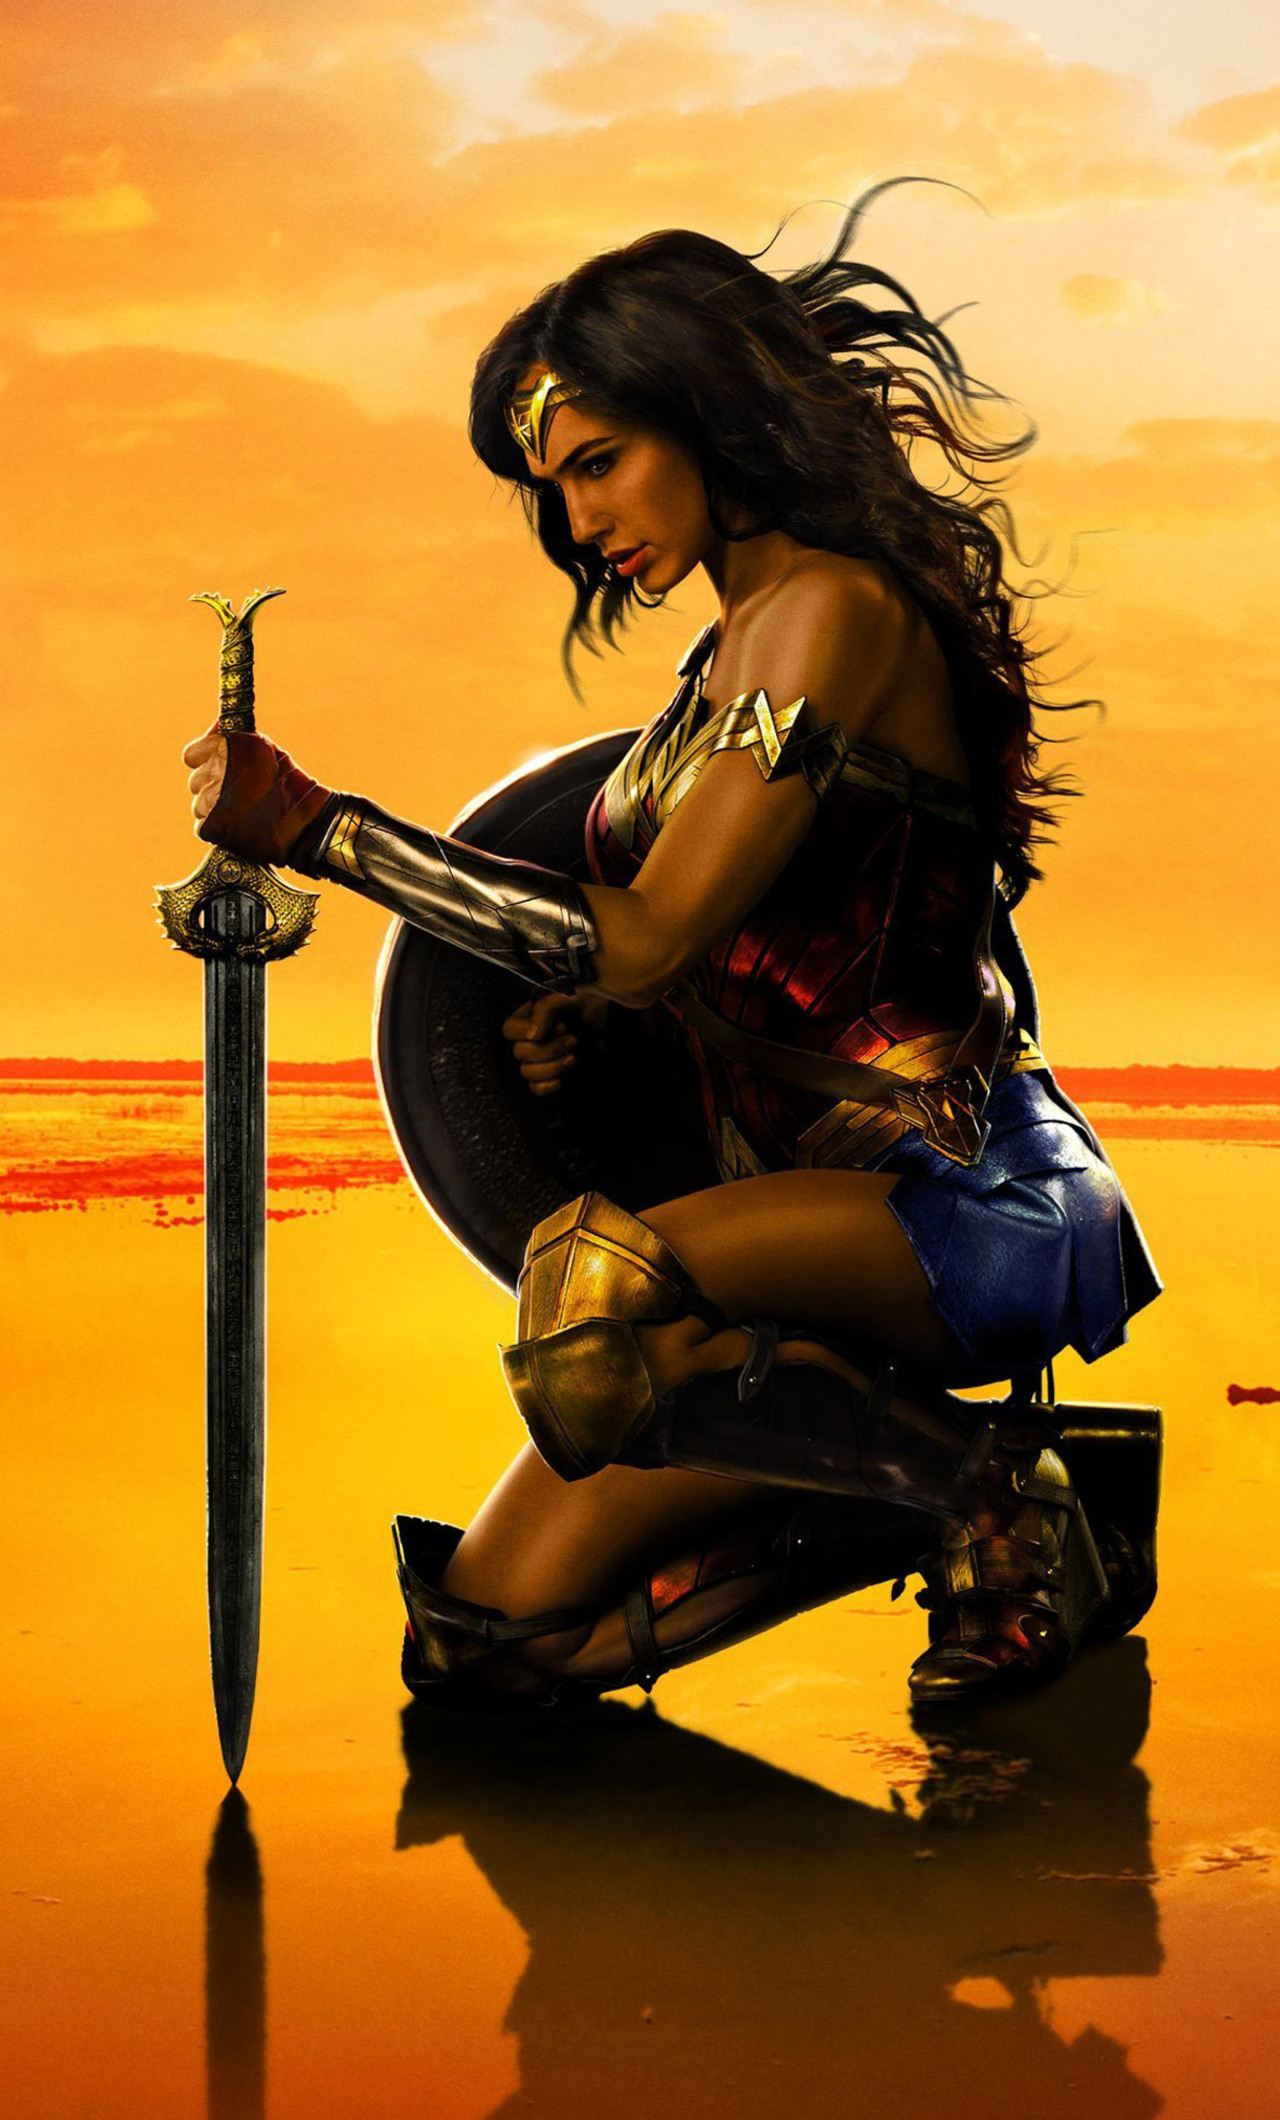 1280x2120 New Wonder Woman Poster Iphone 6+ Hd 4k